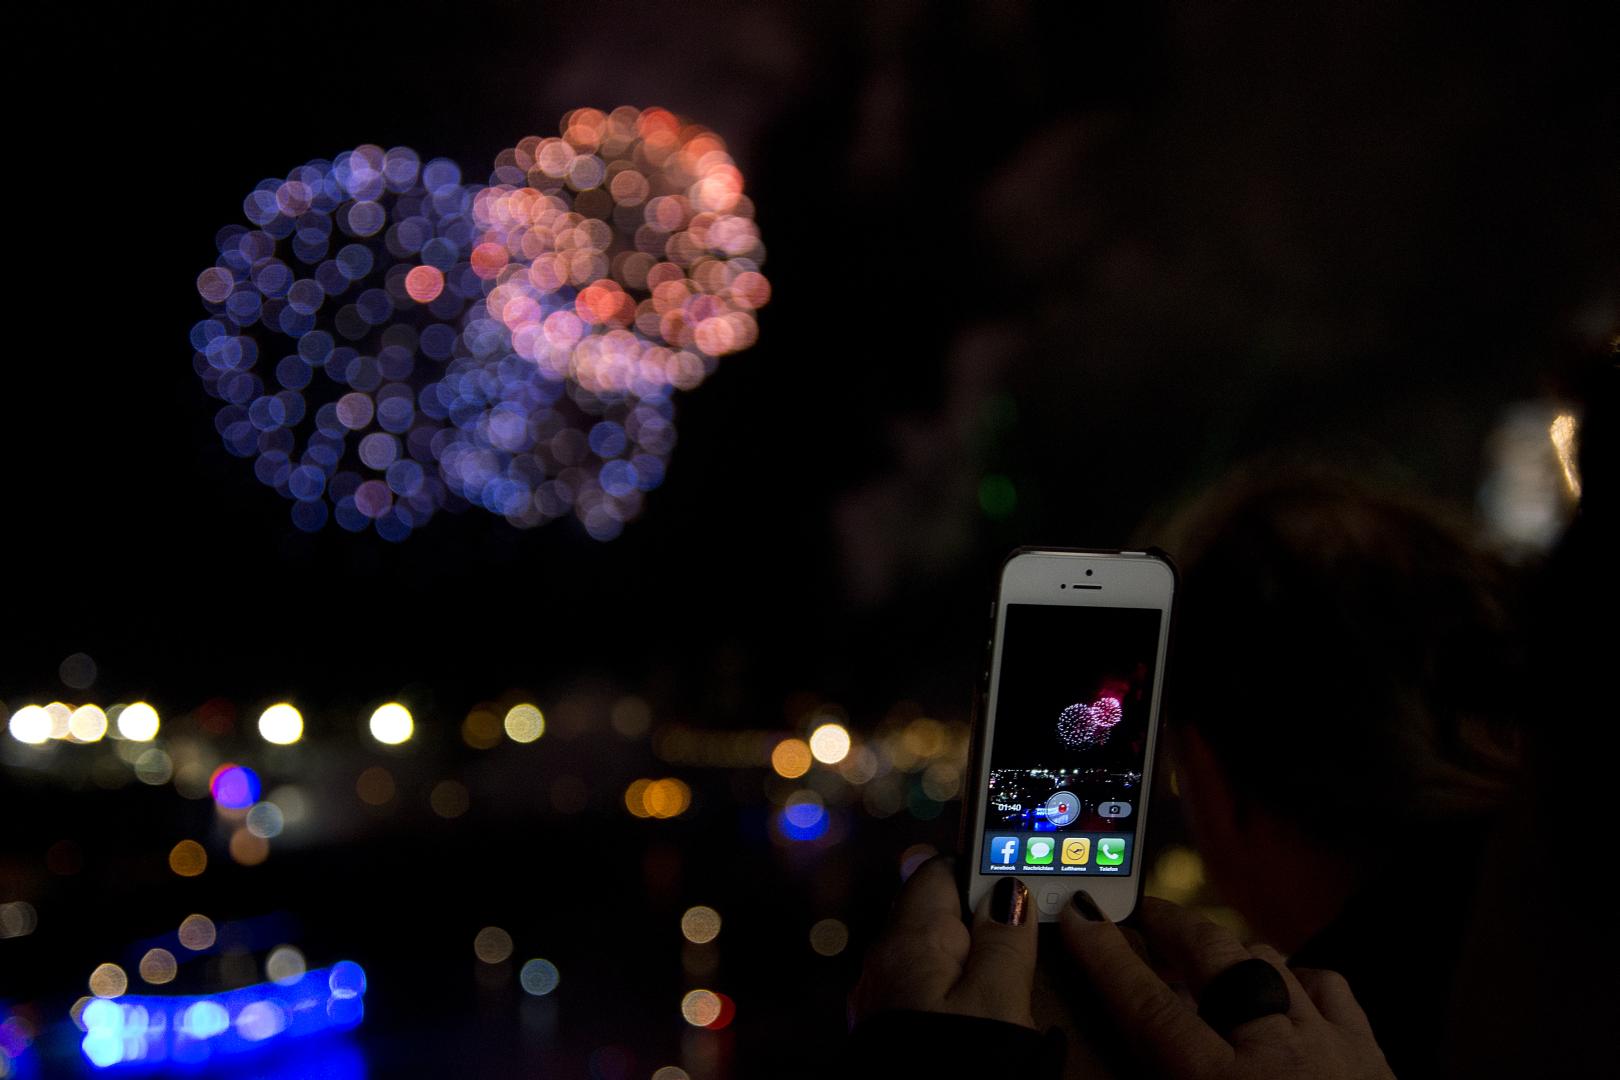 Generation iPhone